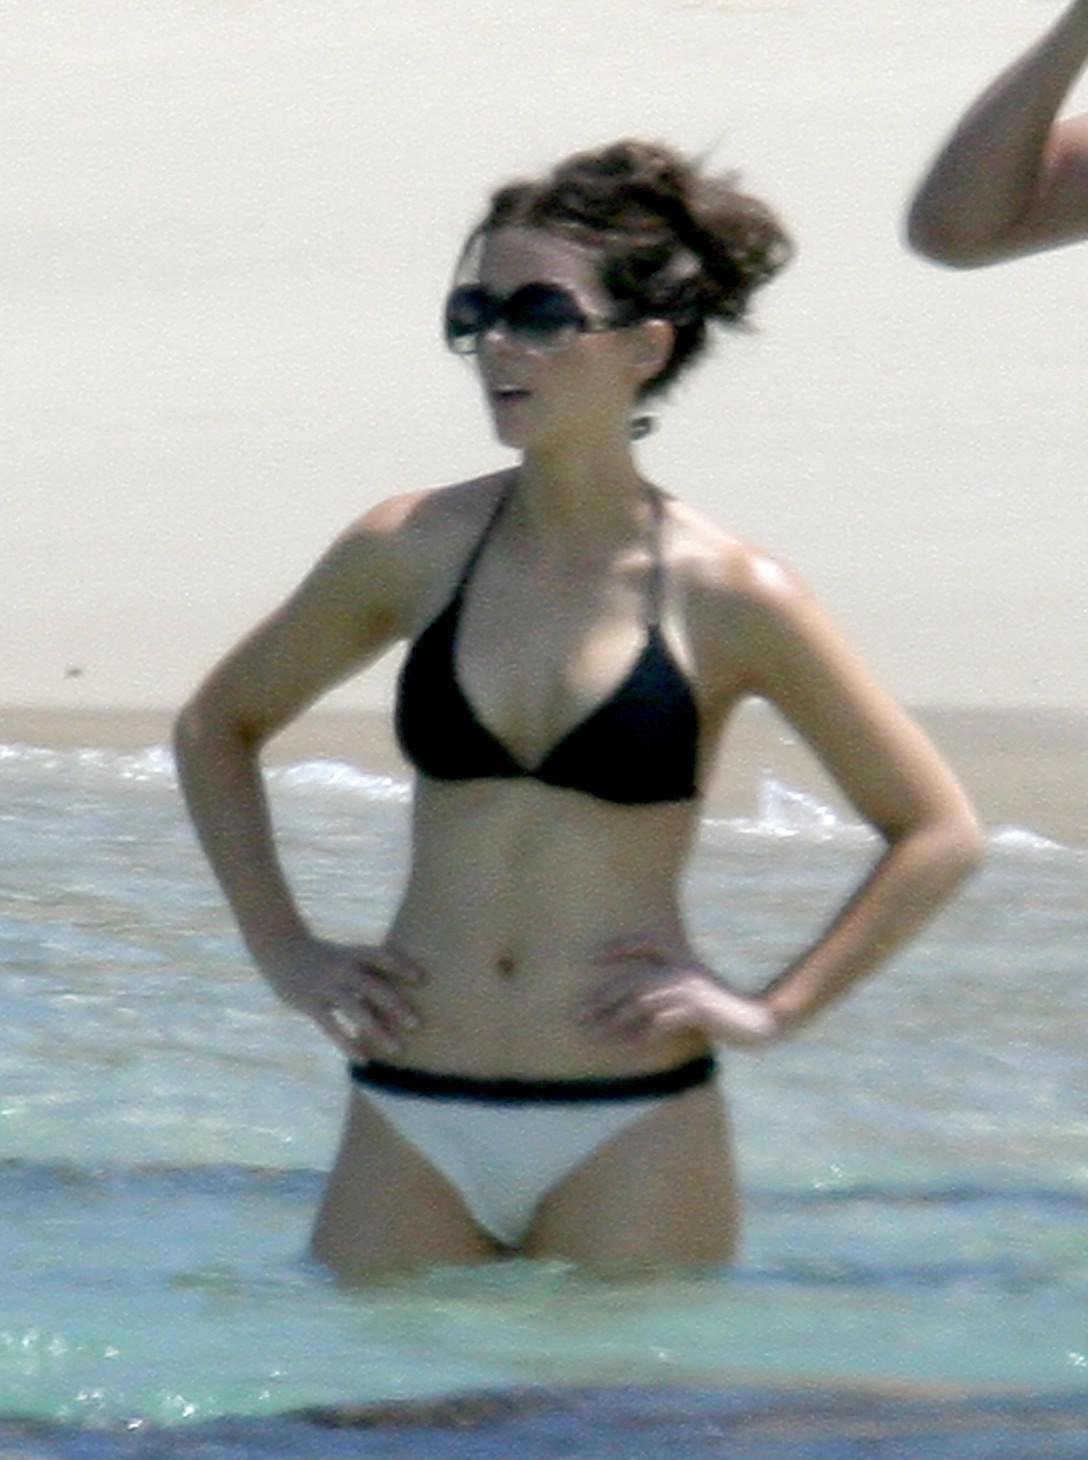 Kate Beckinsale luce su anatoma en playa de Mxico FOTOS